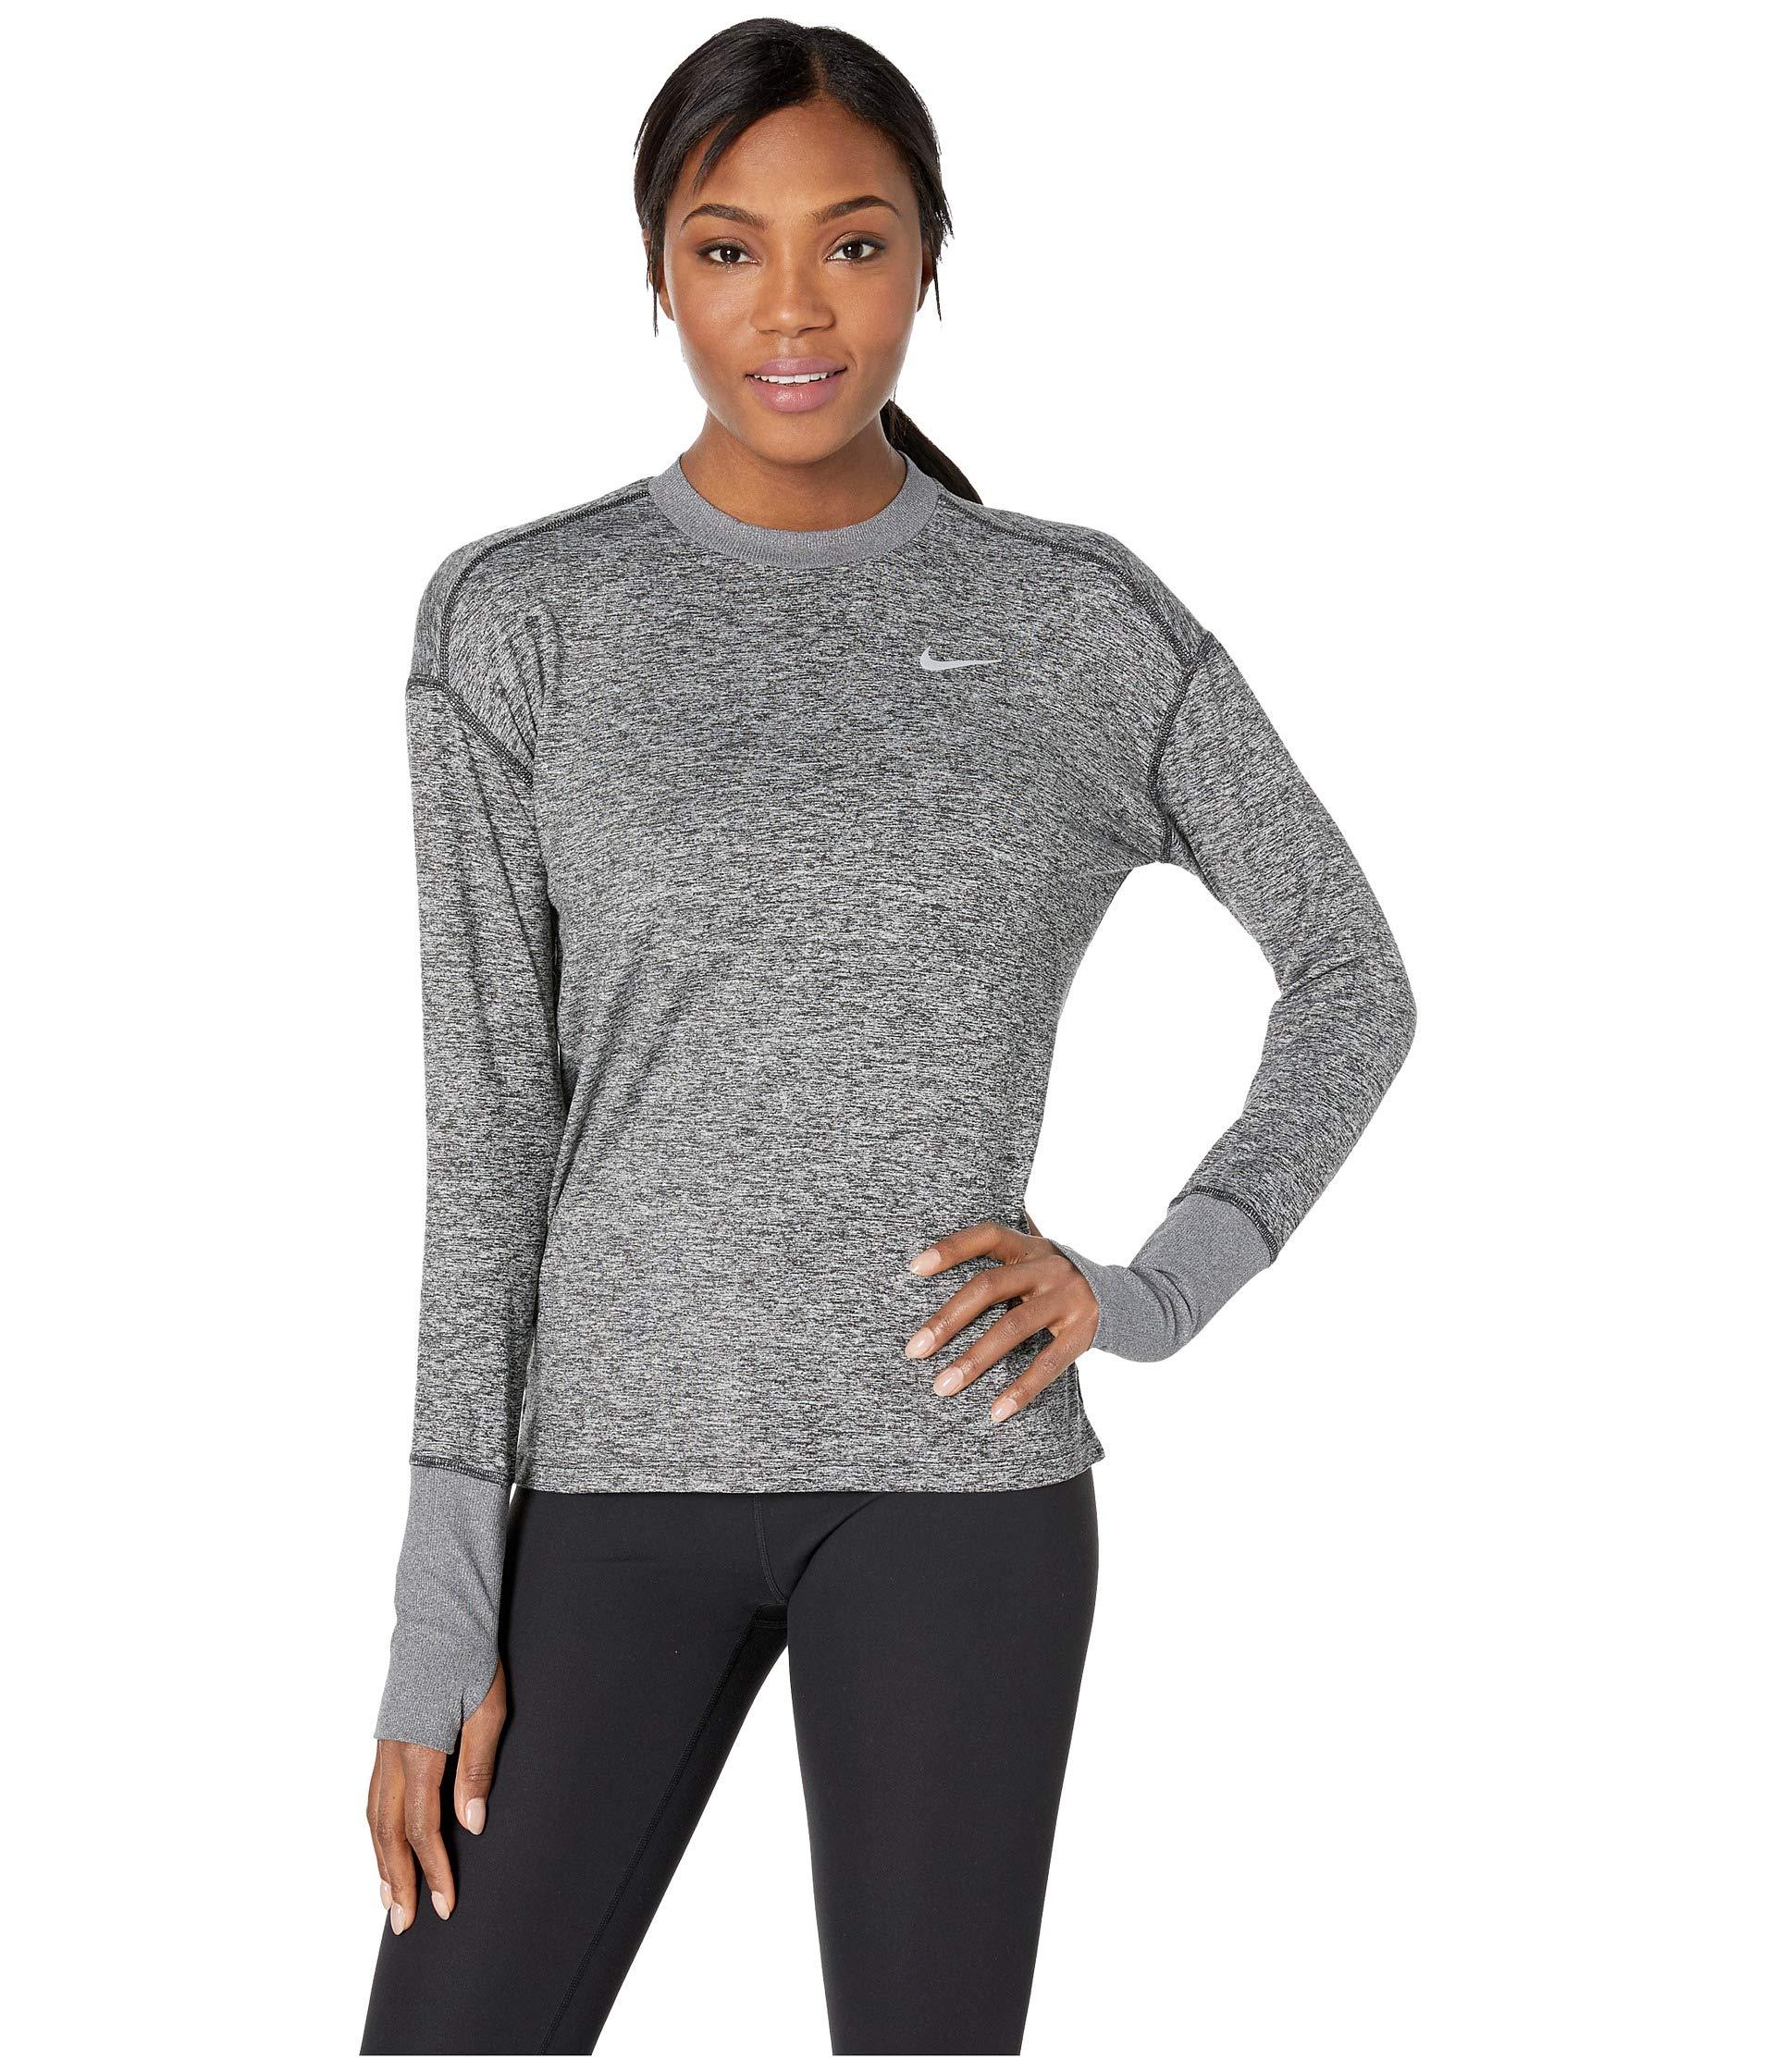 Nike Women's Element Long Sleeve Running Shirt (Black Heather, X-Small)